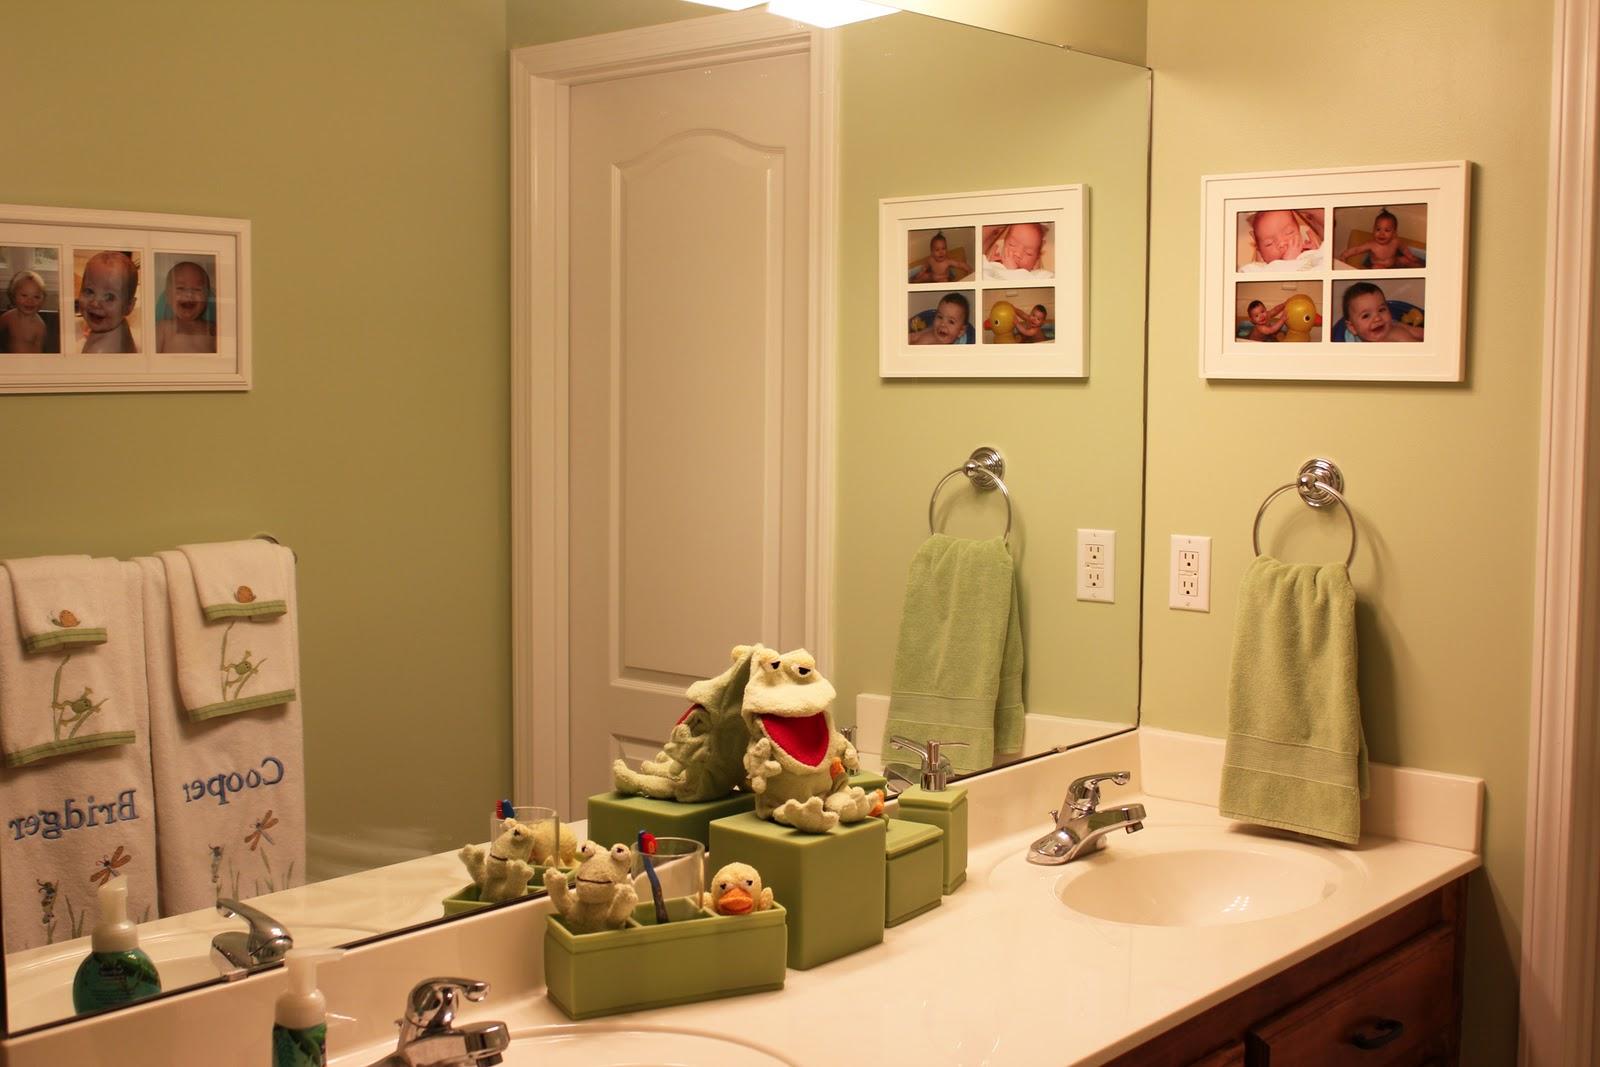 JBigg: Life In Kentucky: Boys Bathroom Remake